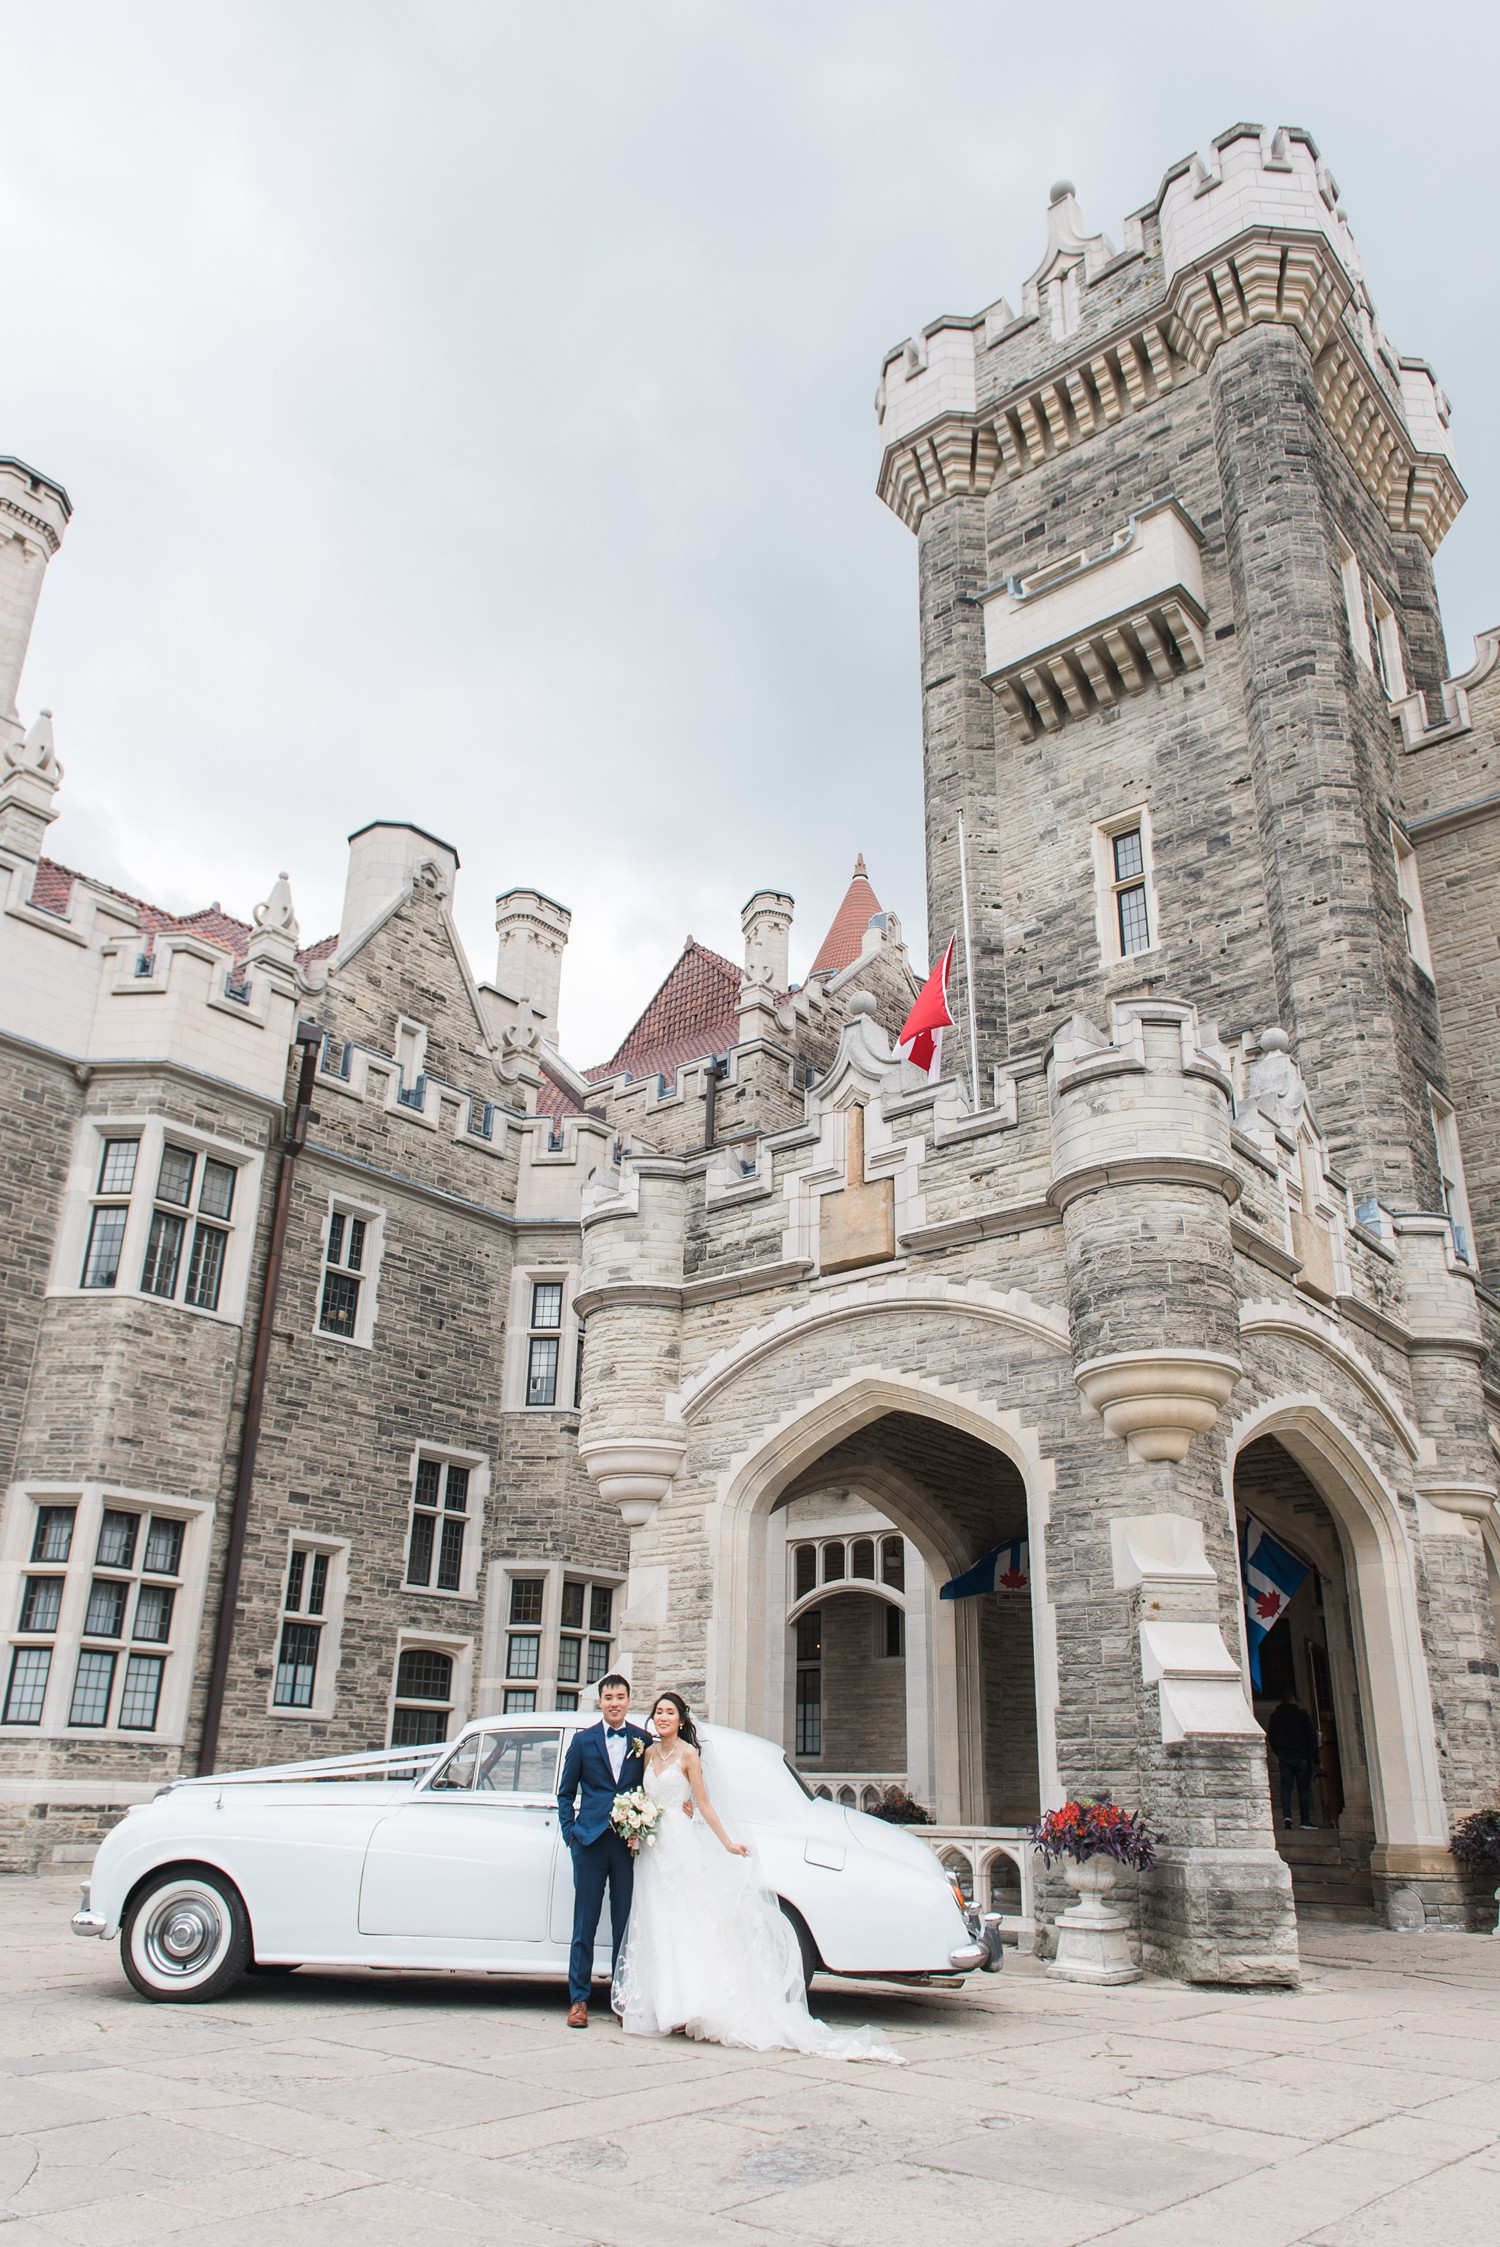 JC-Toronto_Destination_Casa_Loma_Wedding_Photos-Rhythm_Photography-052.jpg